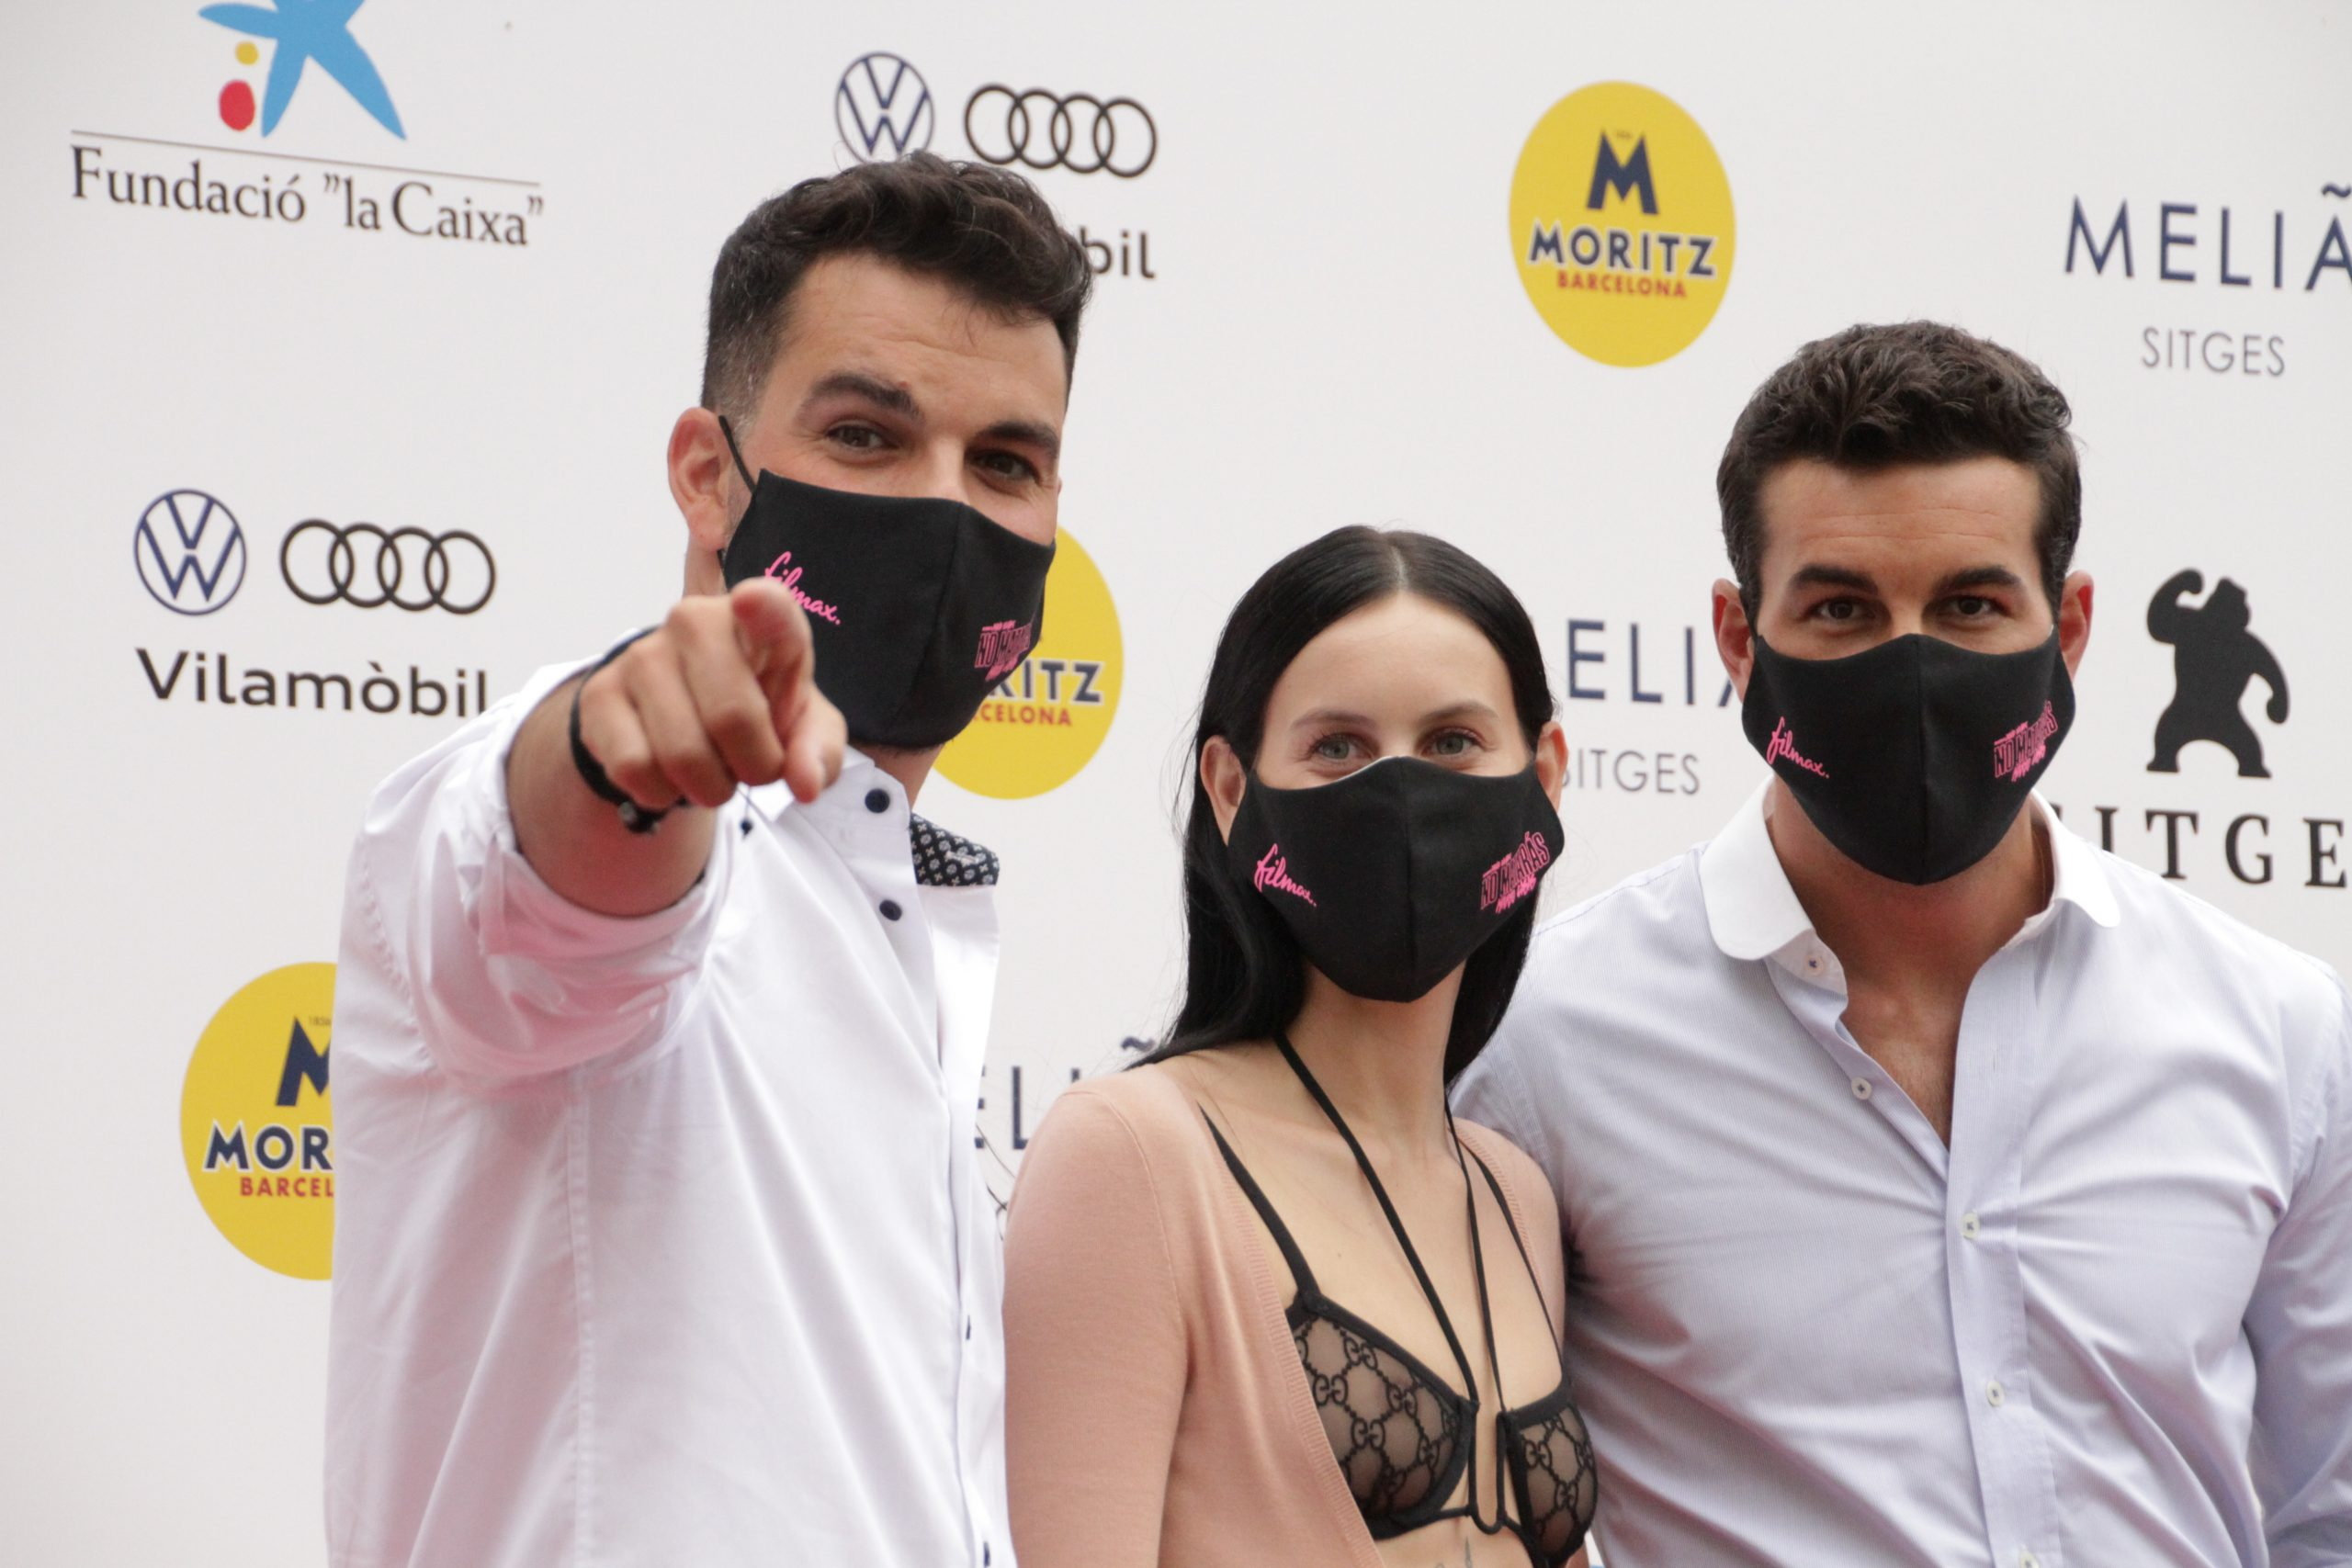 Rueda de prenda de No Matarás en el 53 Sitges Film Festival 2020